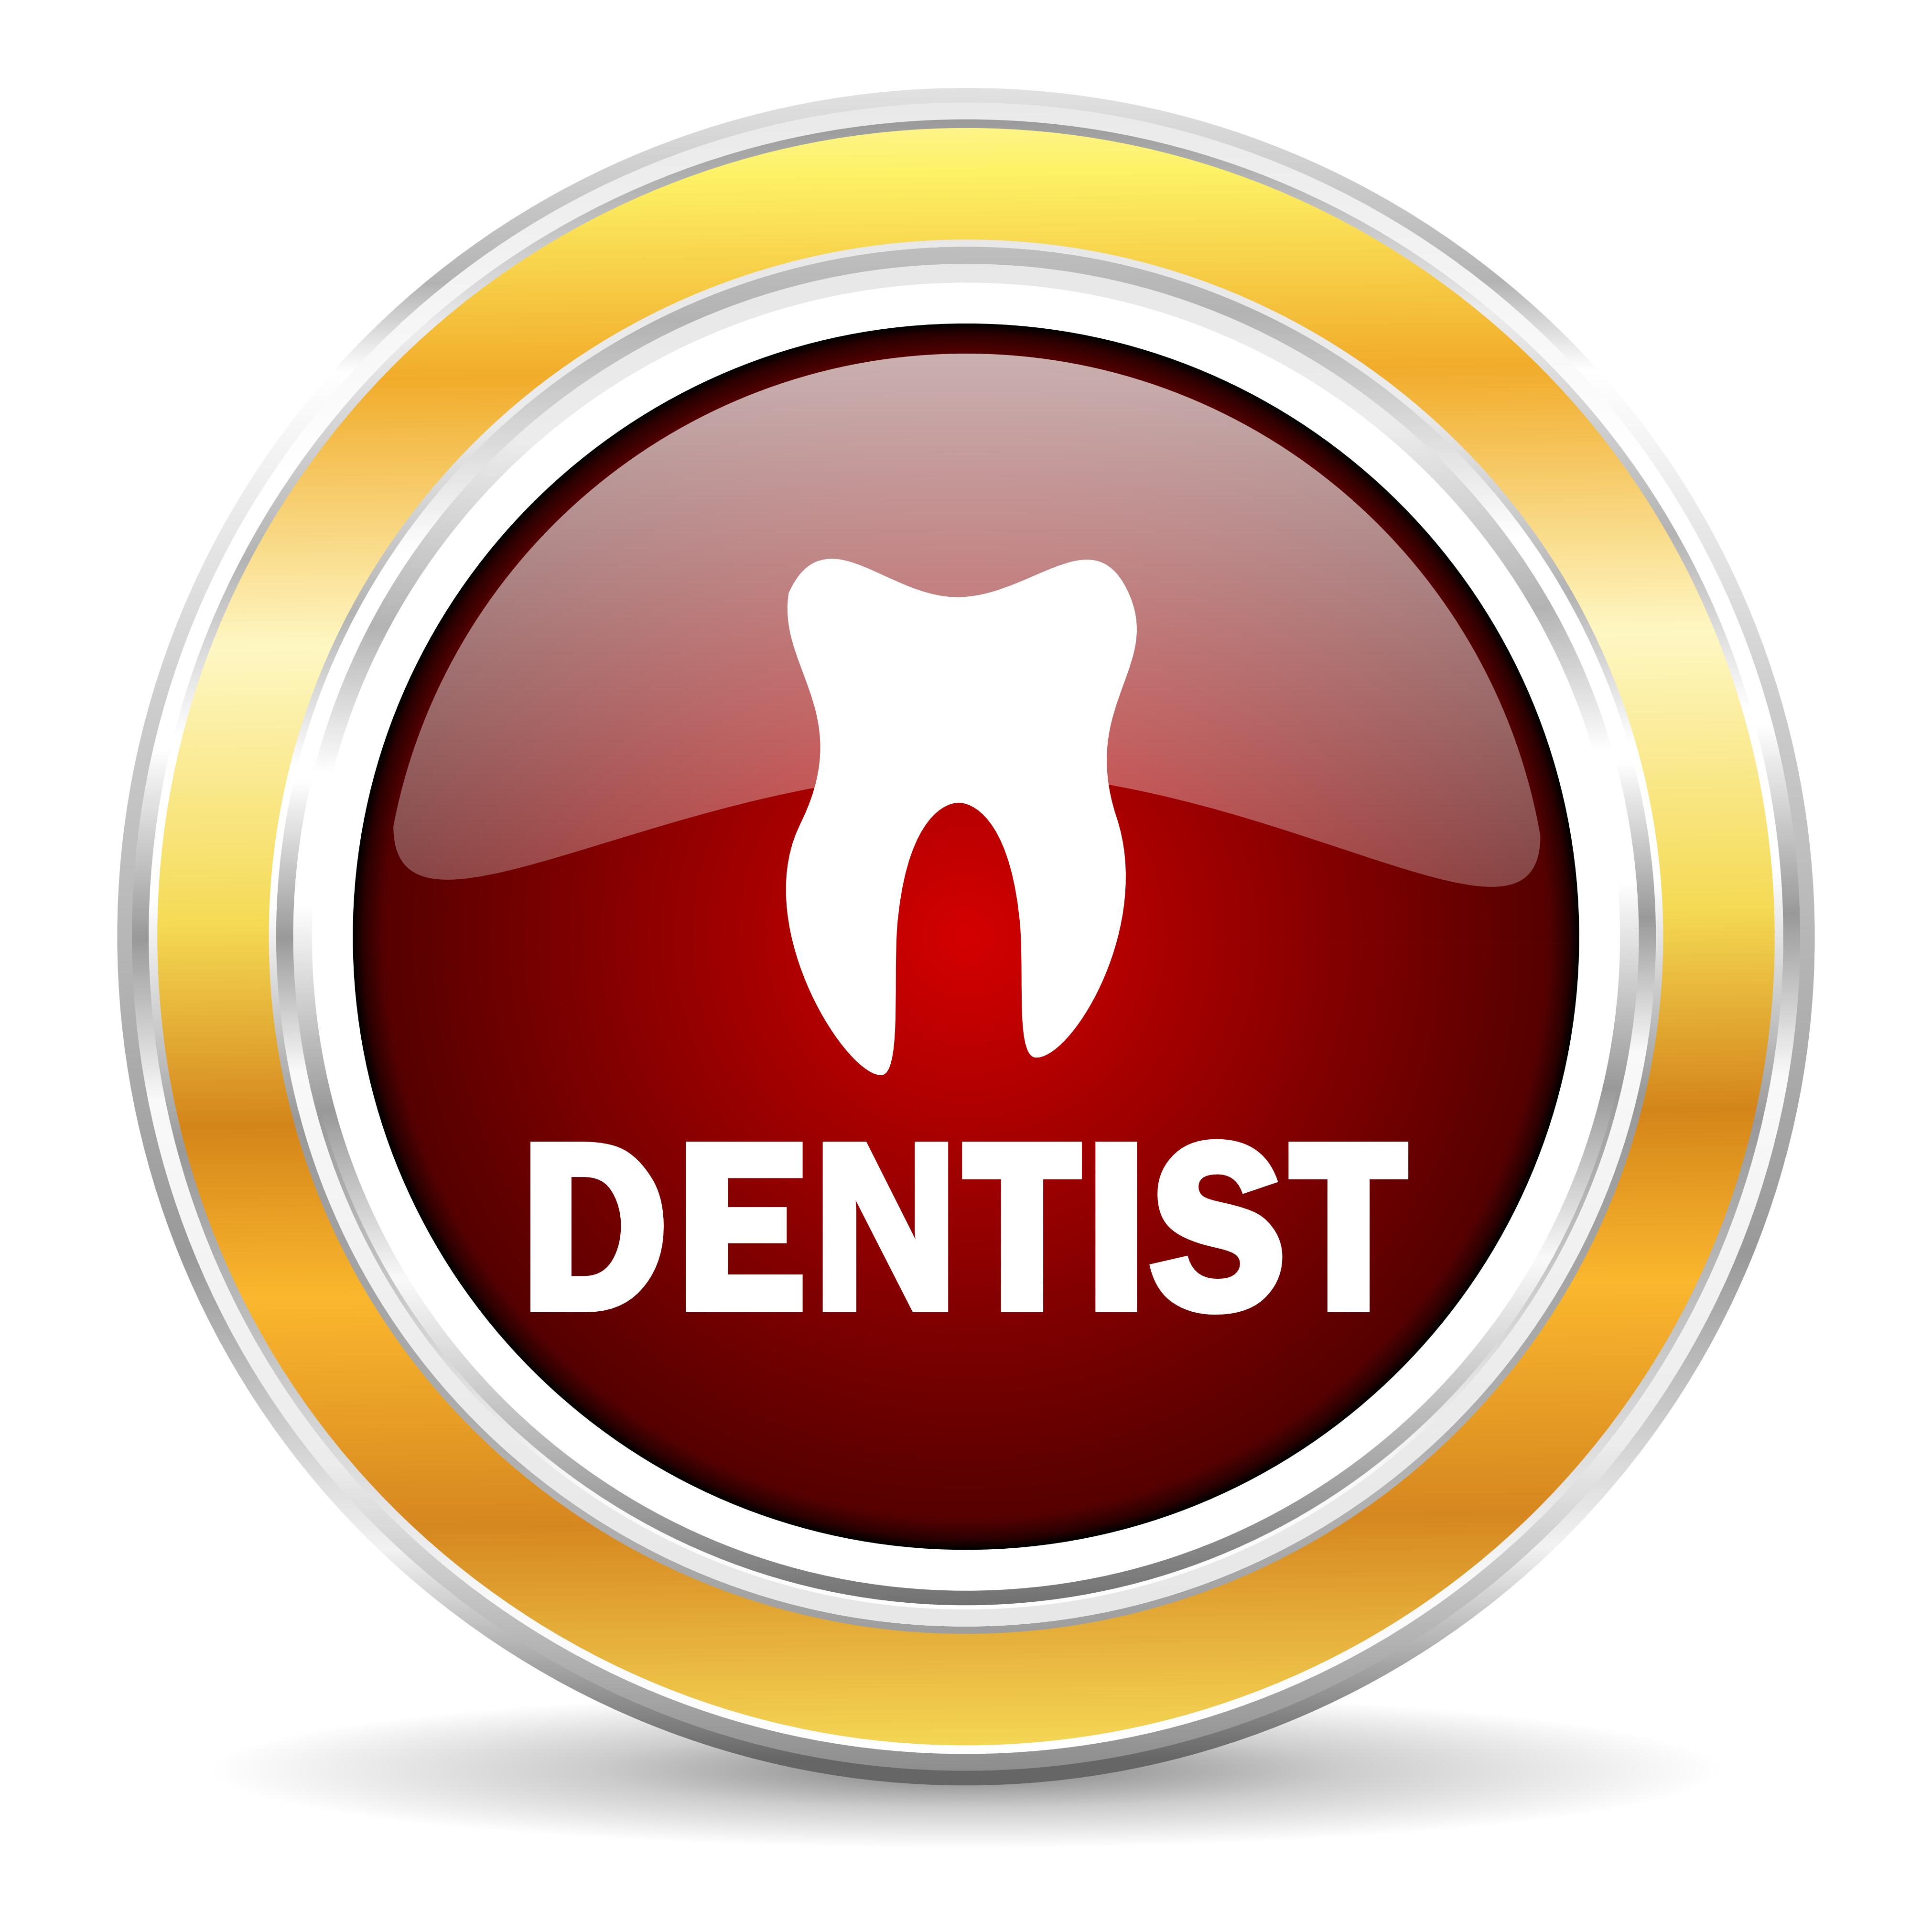 Free Dentist Symbol Cliparts, Download Free Clip Art, Free.